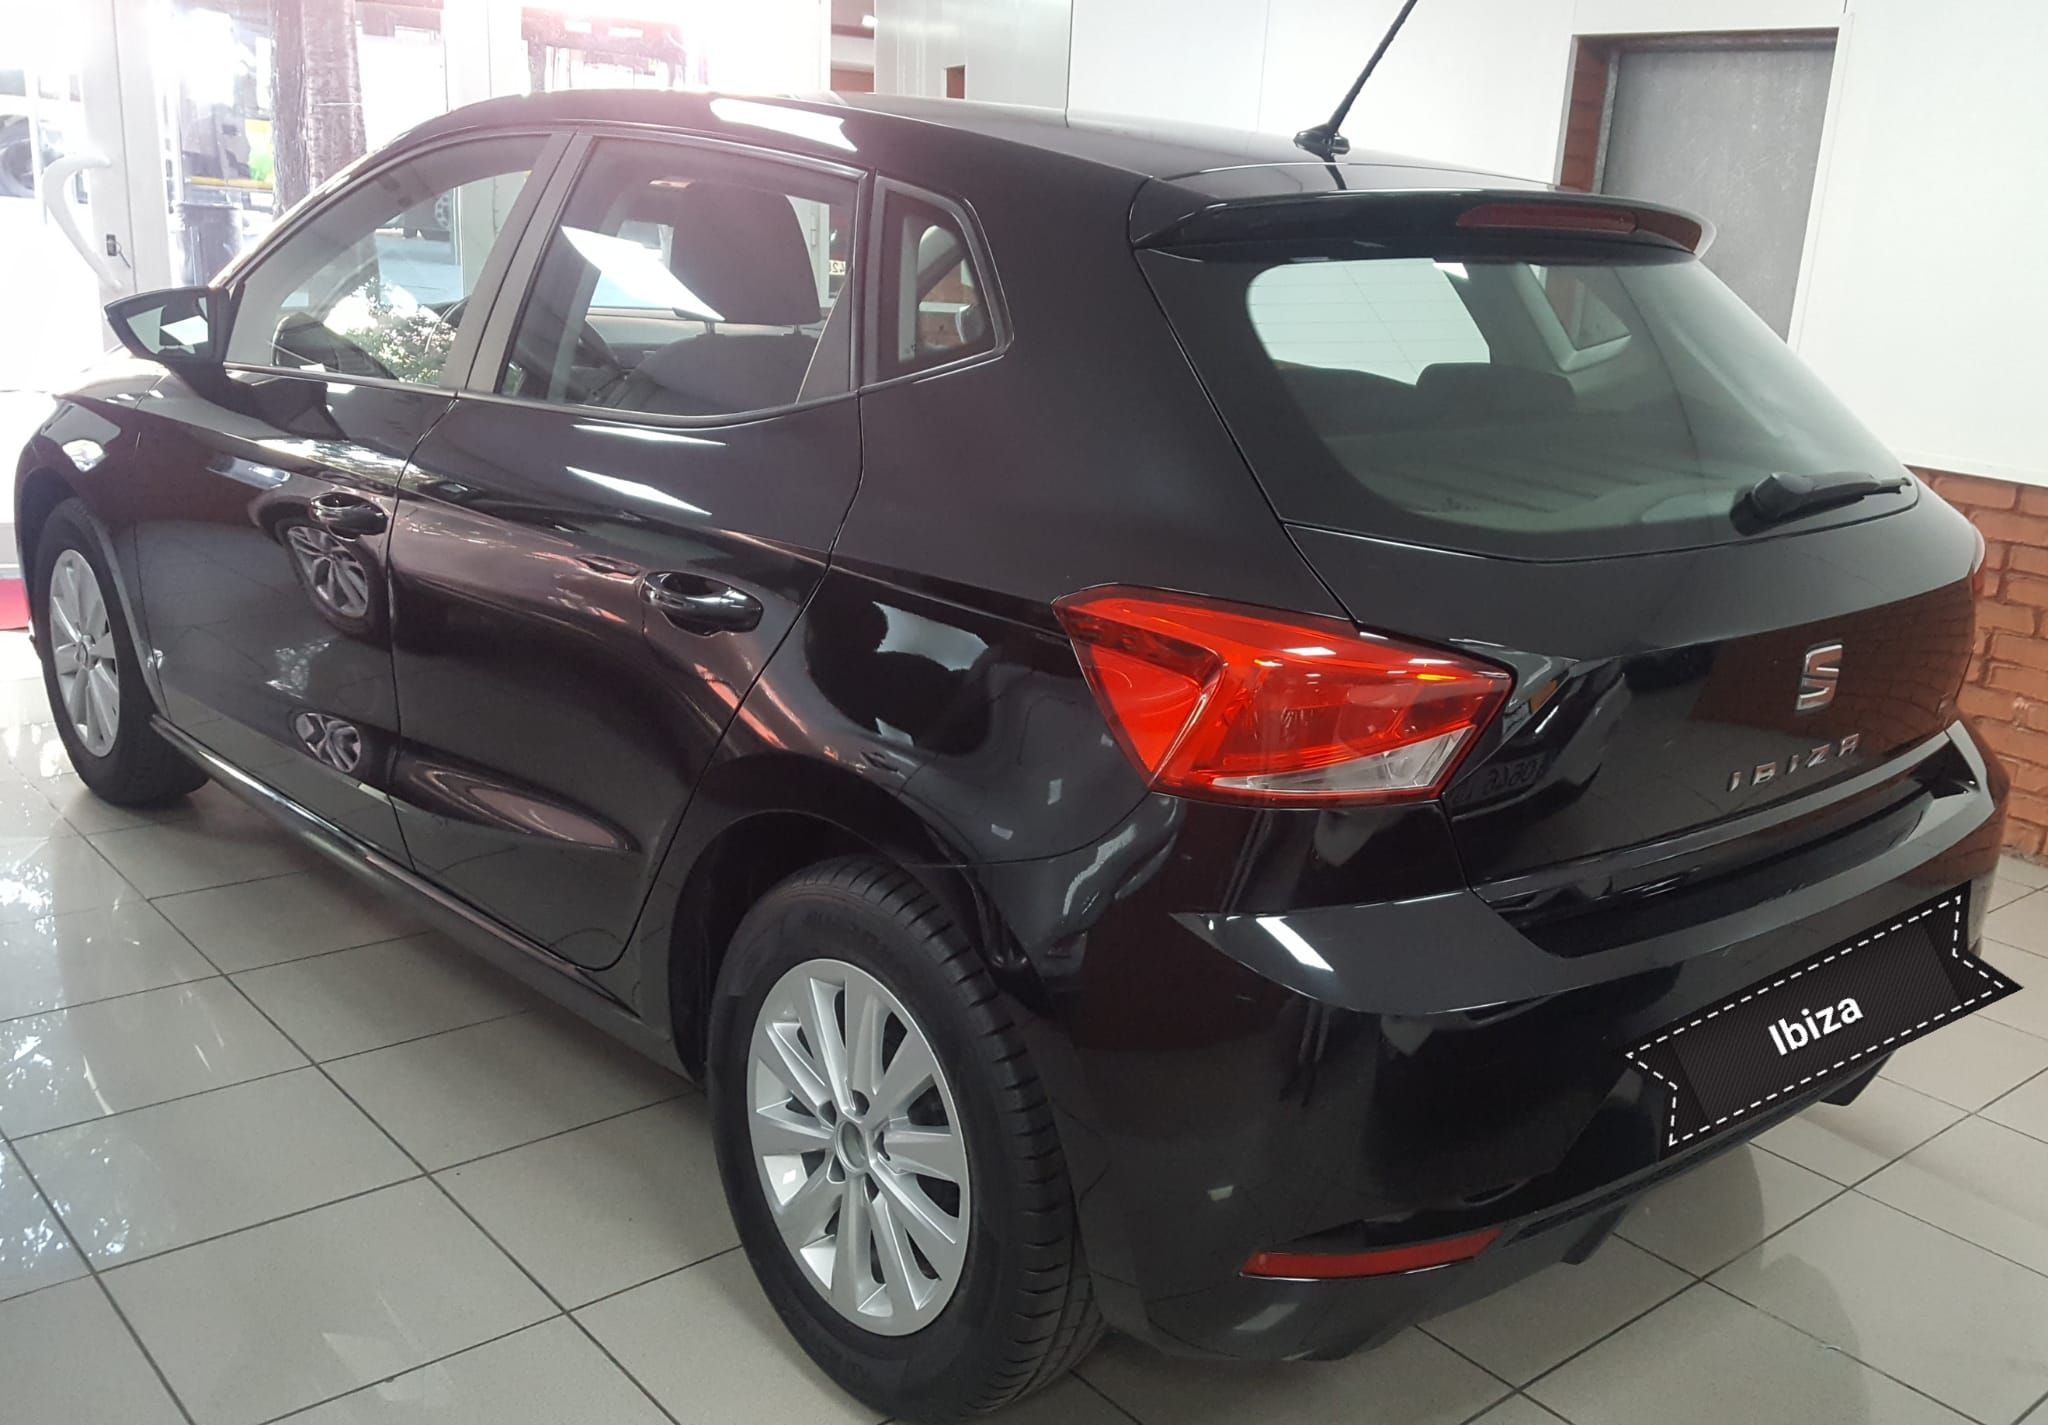 Seat Ibiza 1.0 55 kw 75 Cv Style:  de Automòbils Rambla